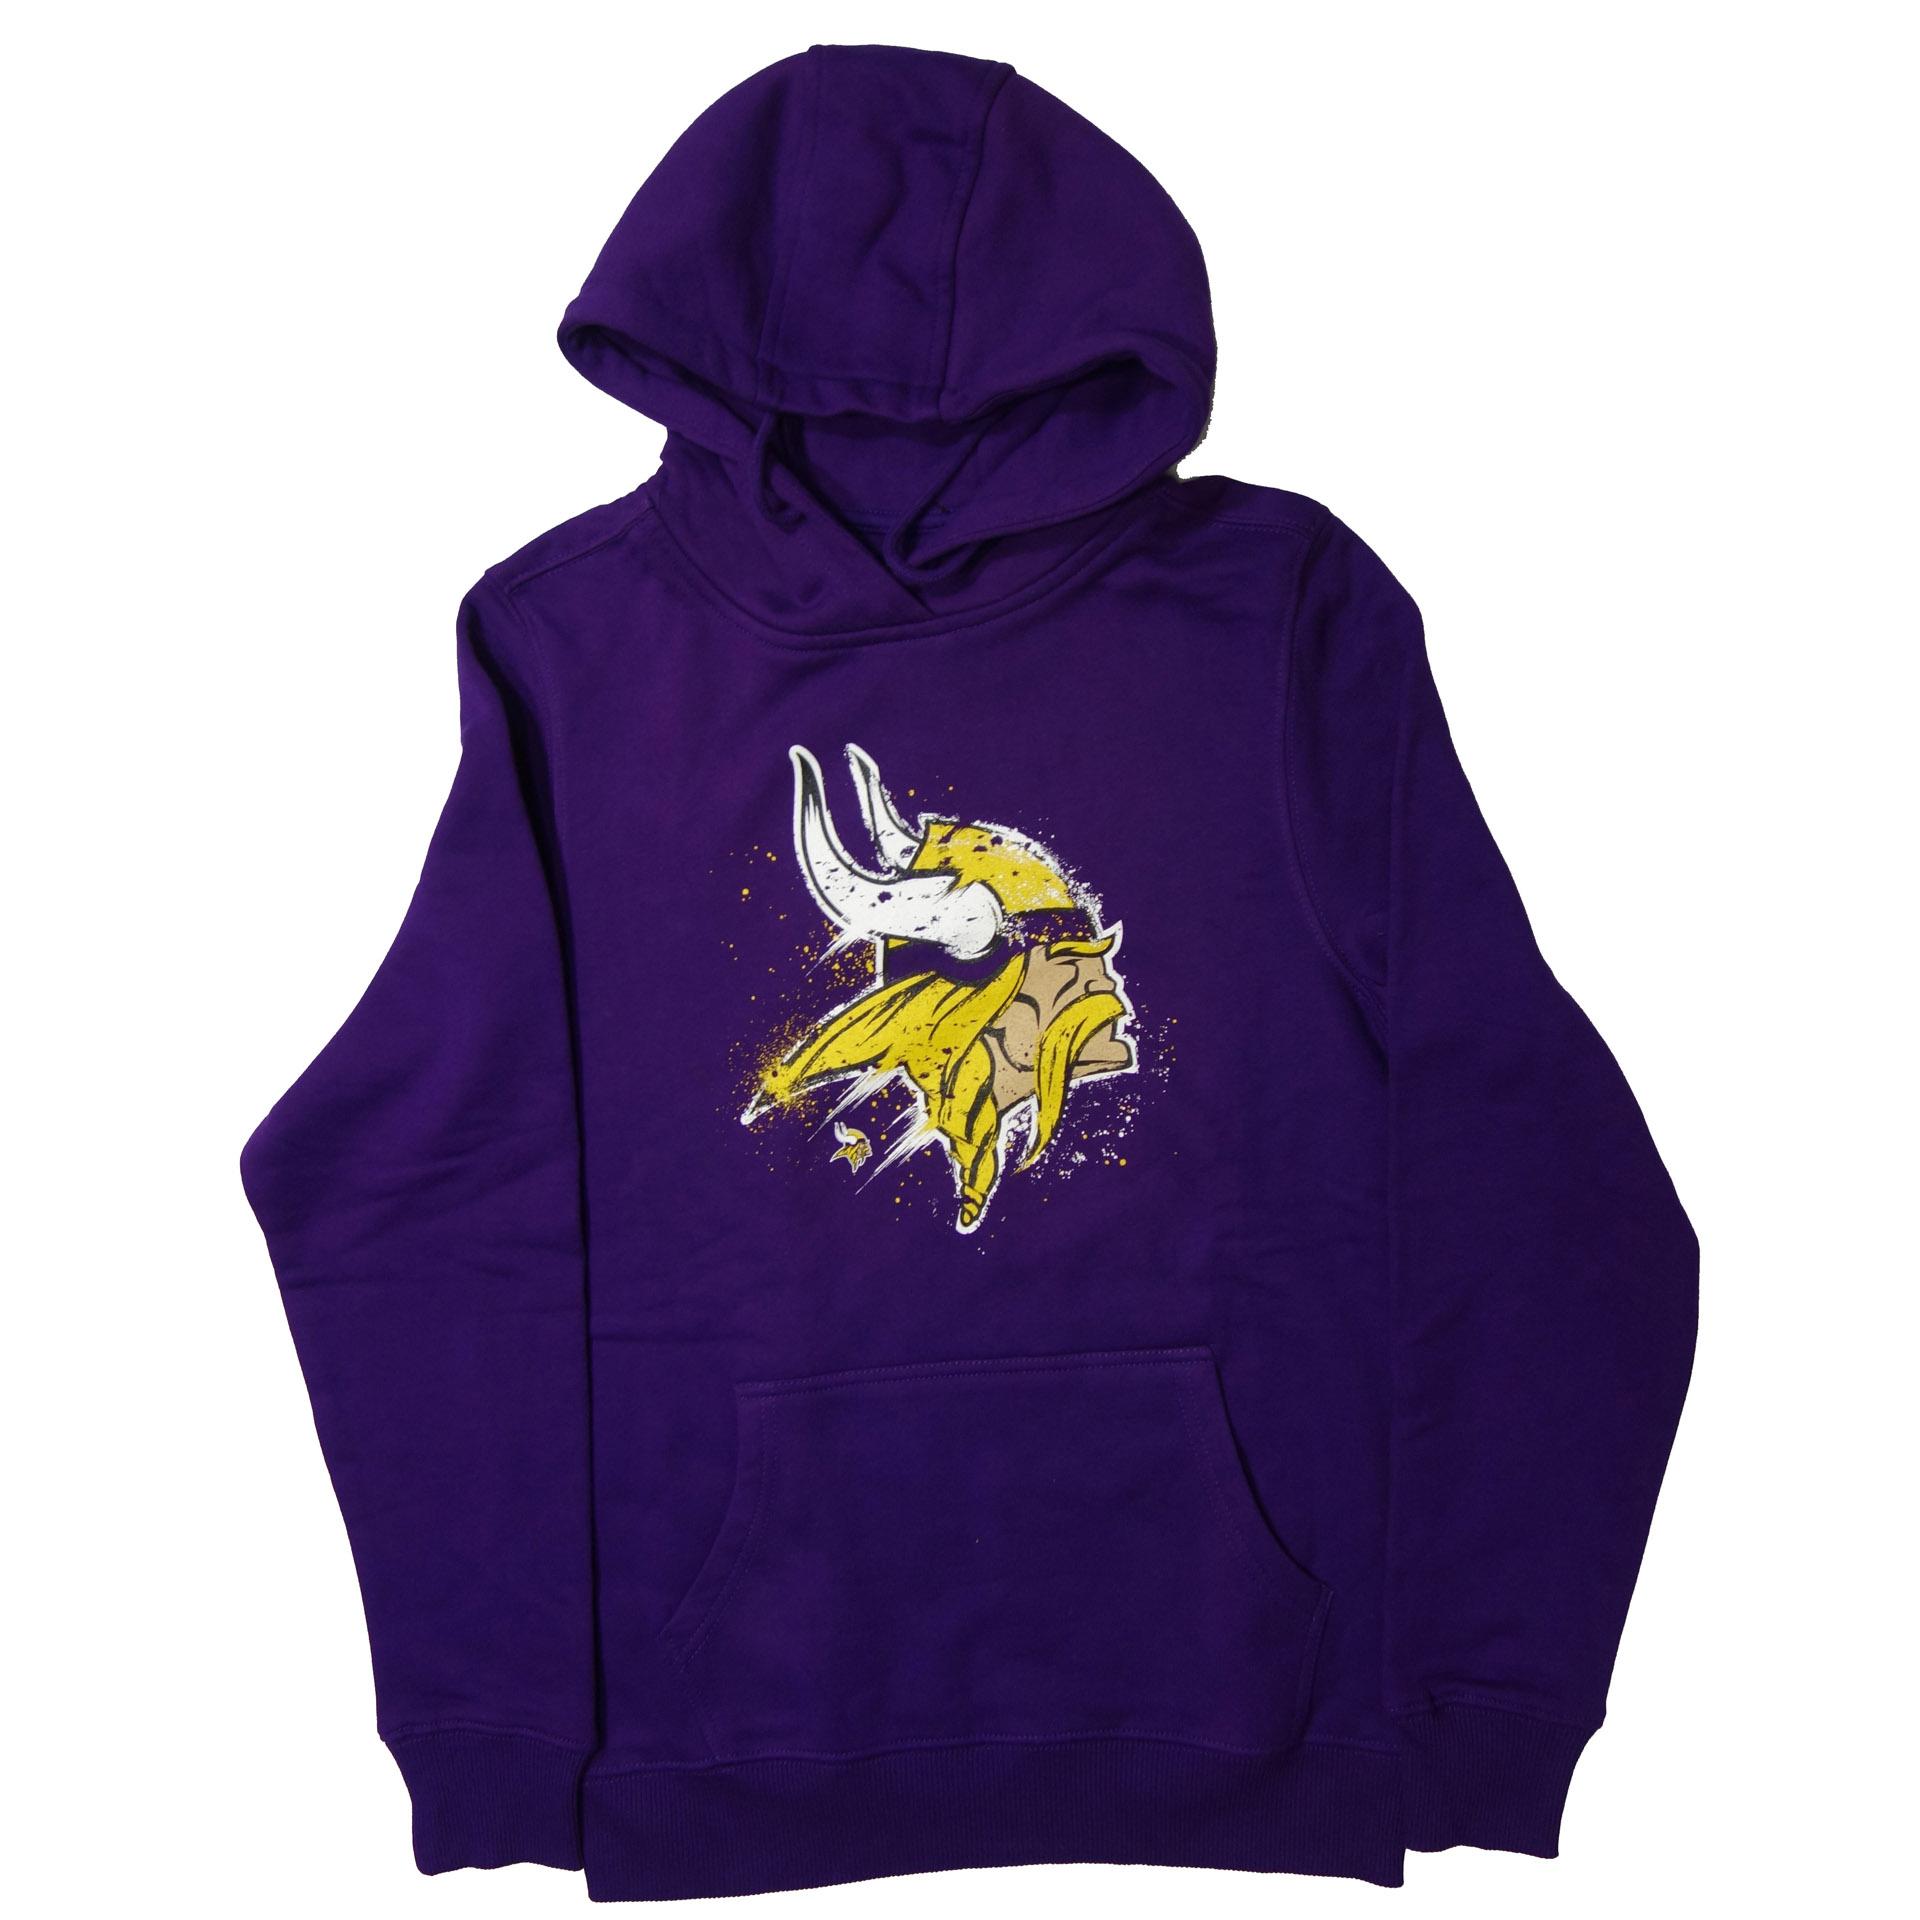 NFL Hoodie Minnesota Vikings